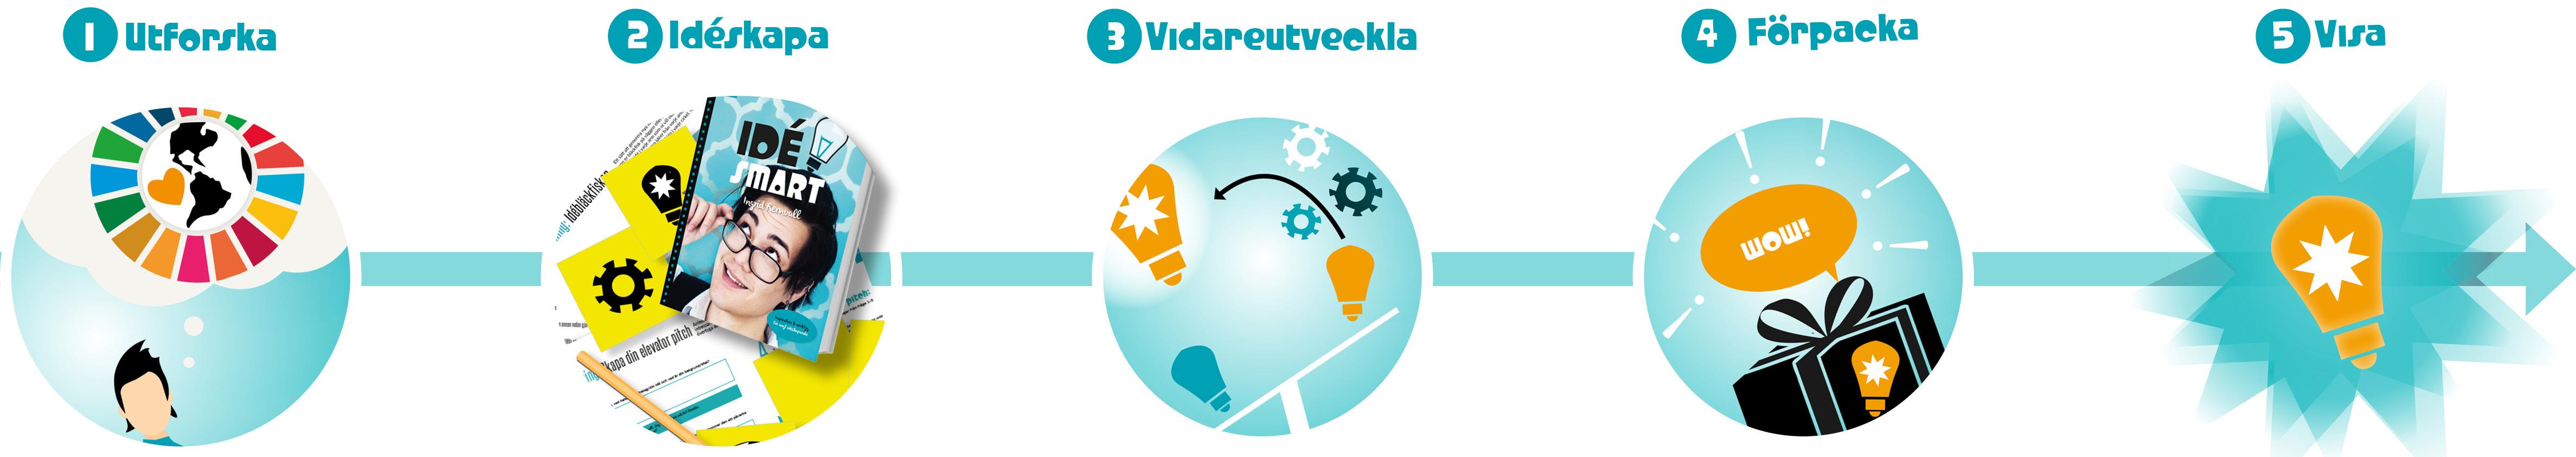 innovationsprocessen_idesmart (kopia)